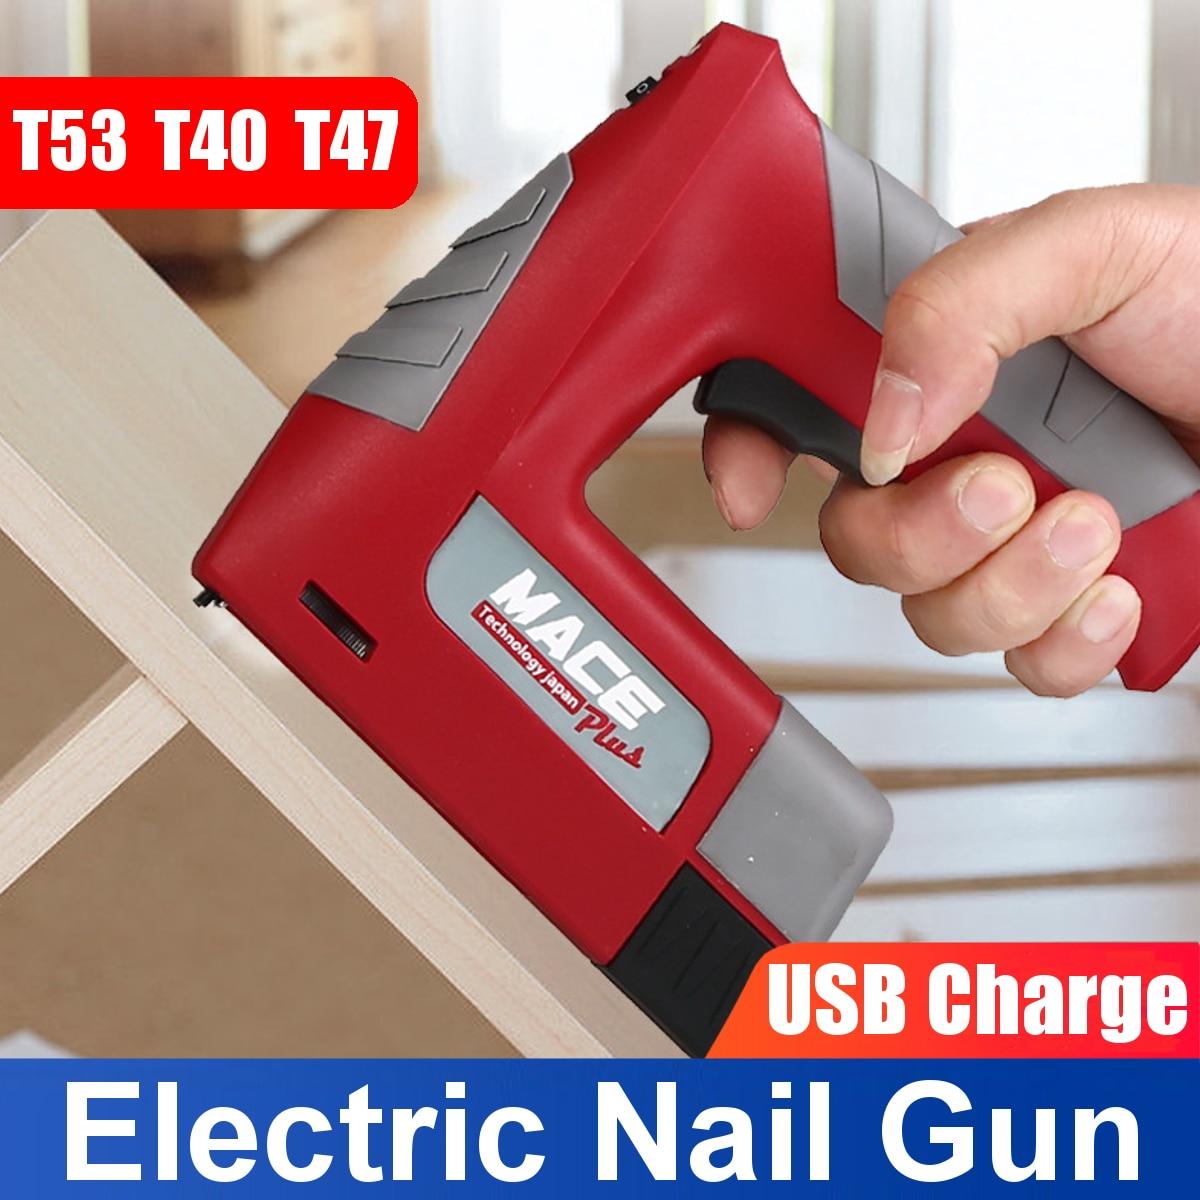 Electric Nail Gun 4.2V Power Brad Nailer Stapler Woodworking Straight Nail&Door Nail Staple Gun USB Rechargeable Lithium Battery